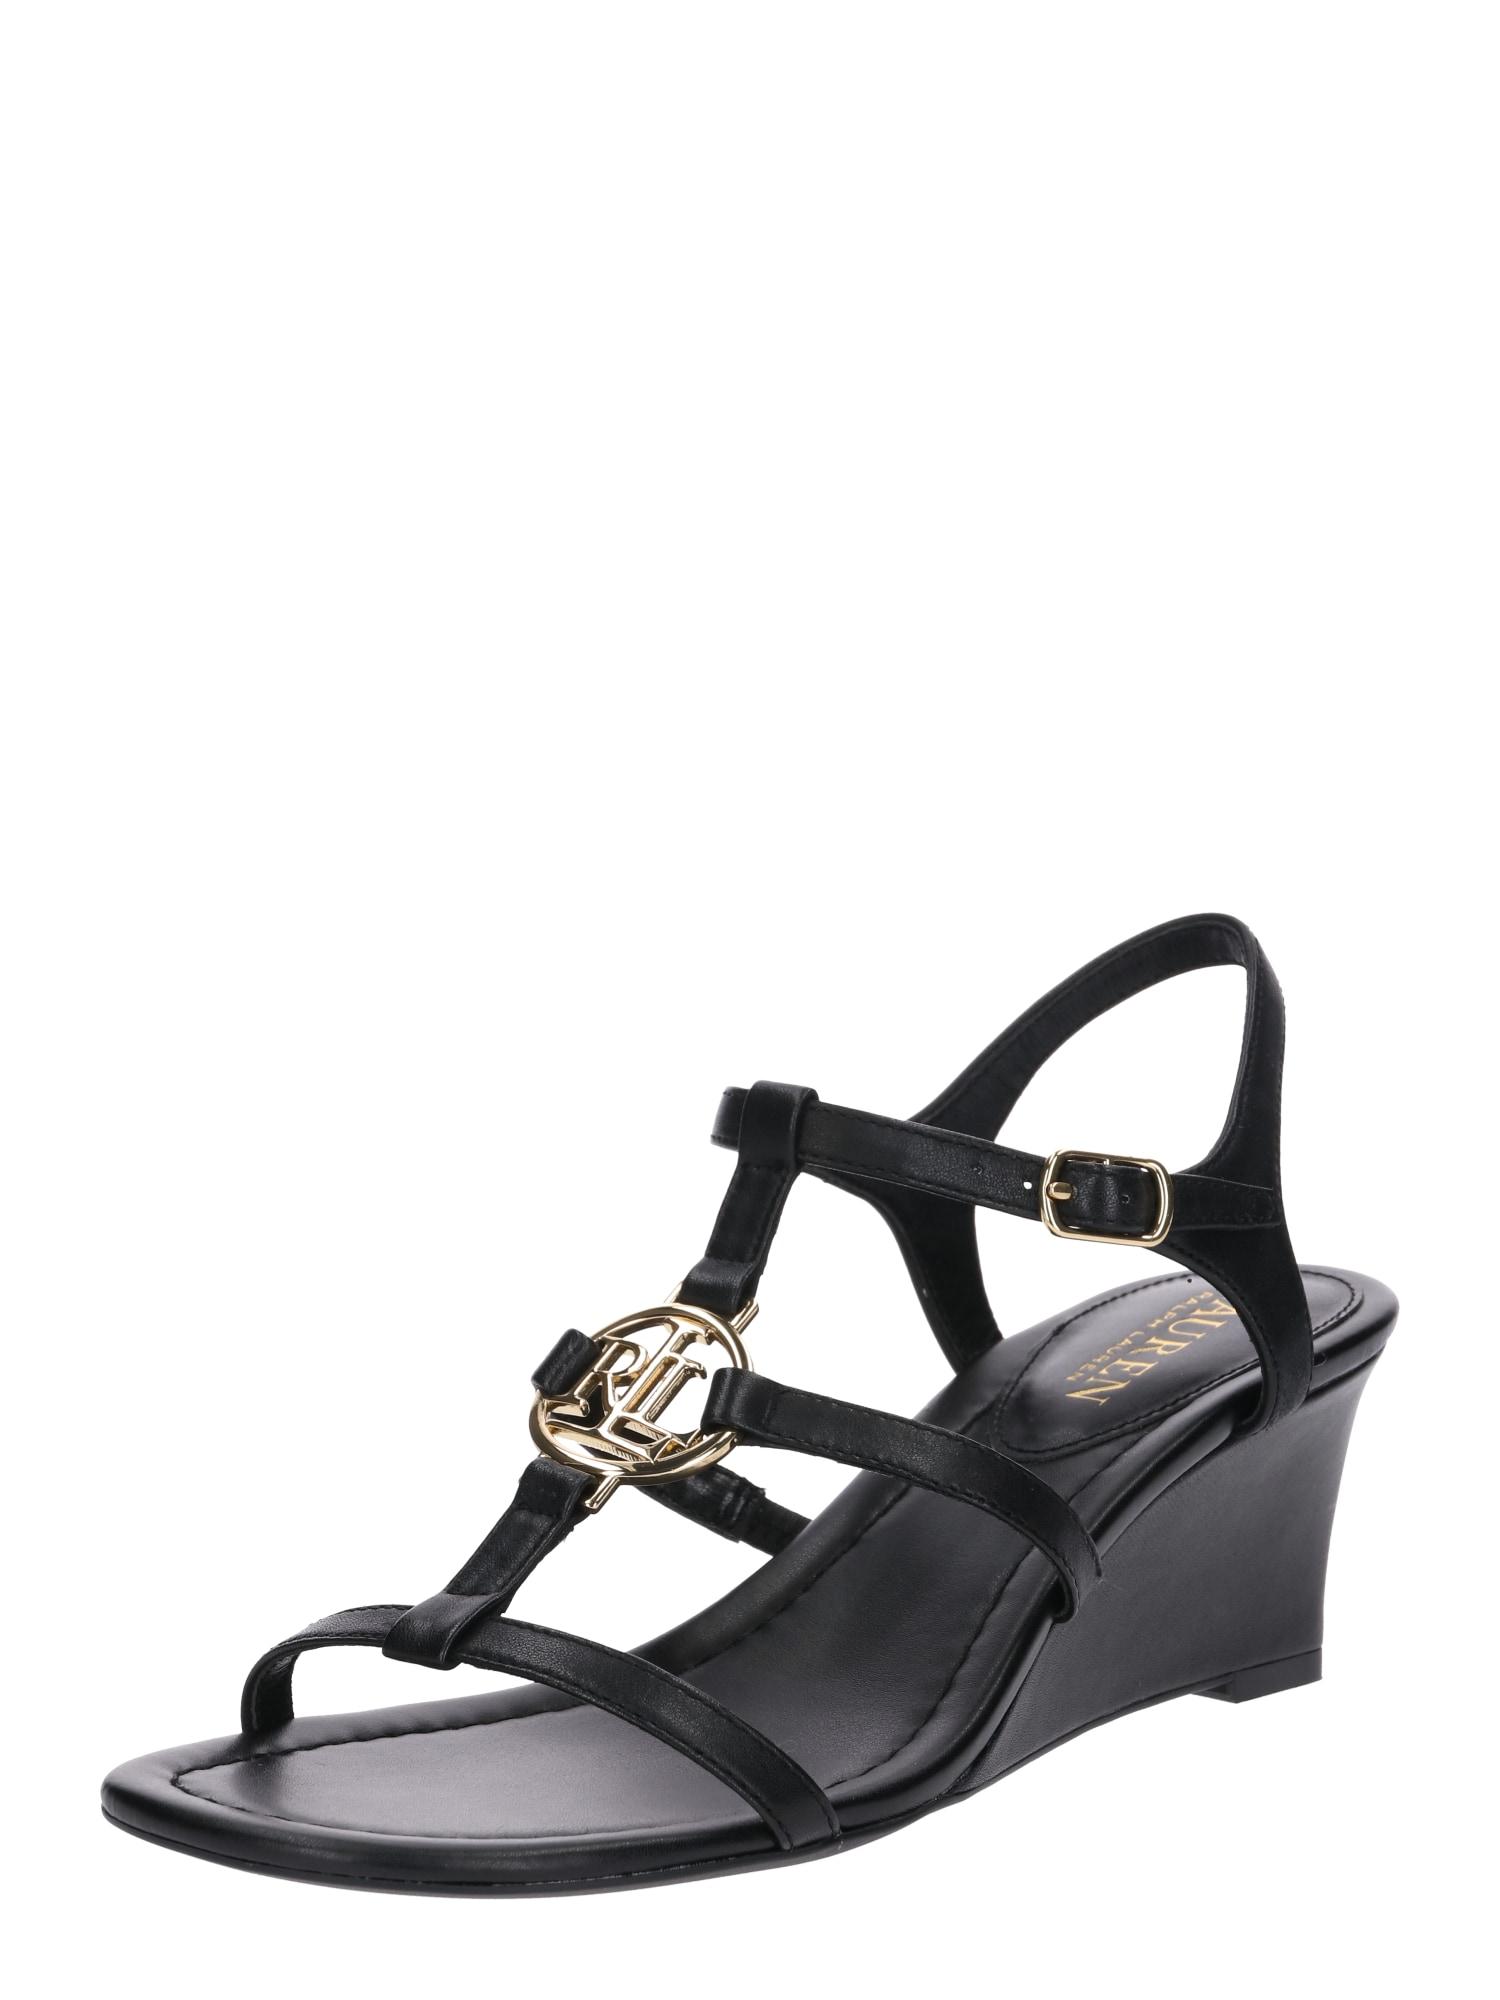 Páskové sandály Elina černá Lauren Ralph Lauren